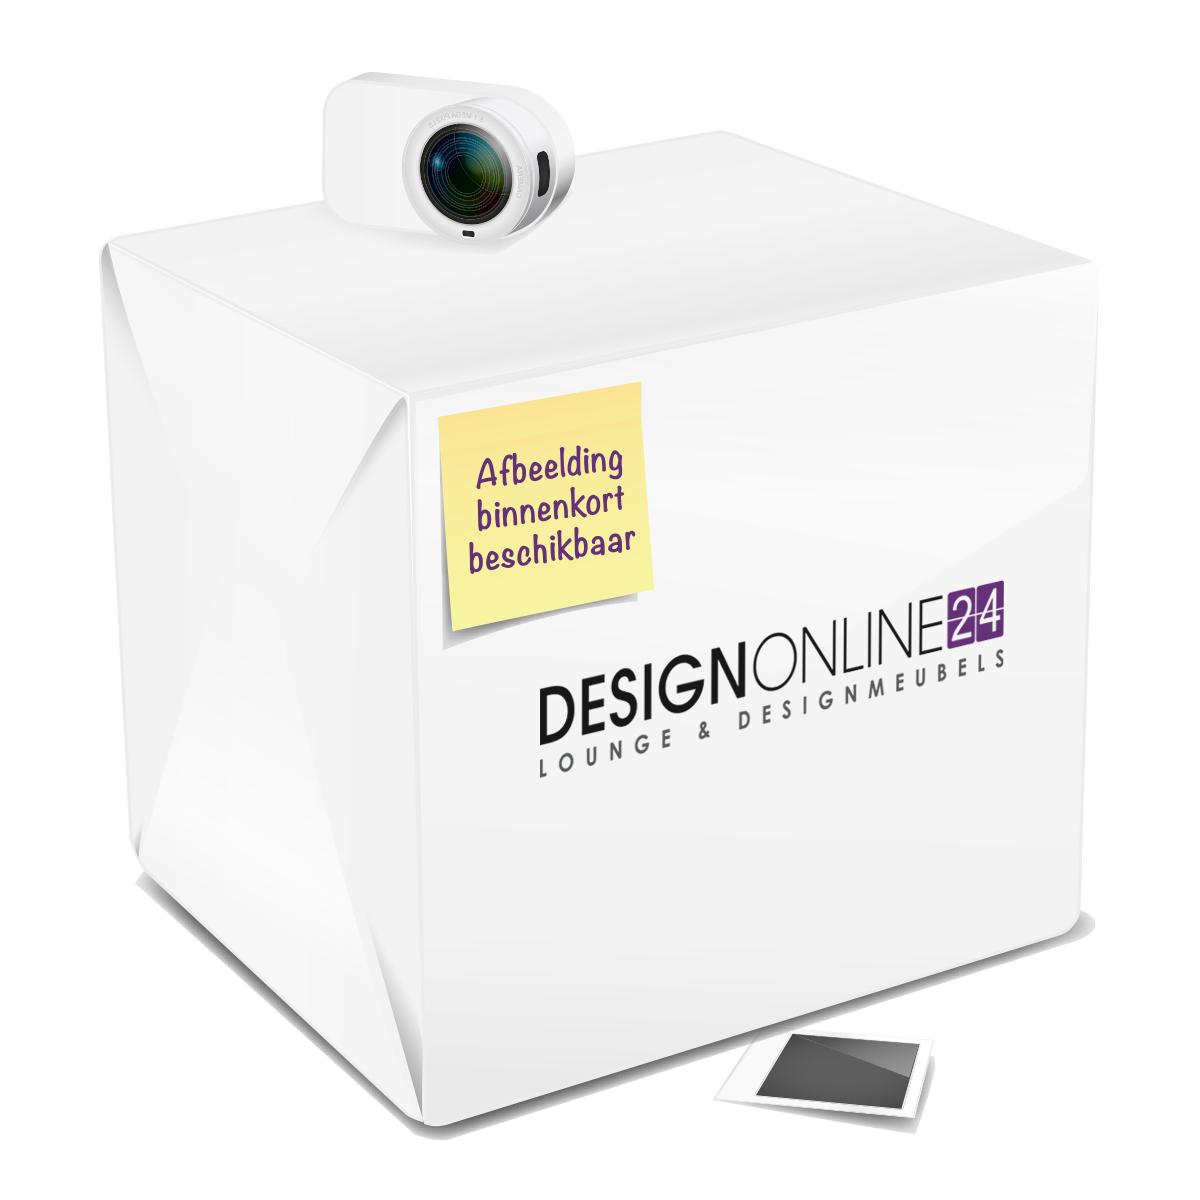 24Designs 24Designs Loungeset 6 Personen - Cecina - Zandkleur Polyrattan Wicker met Bruine kussens